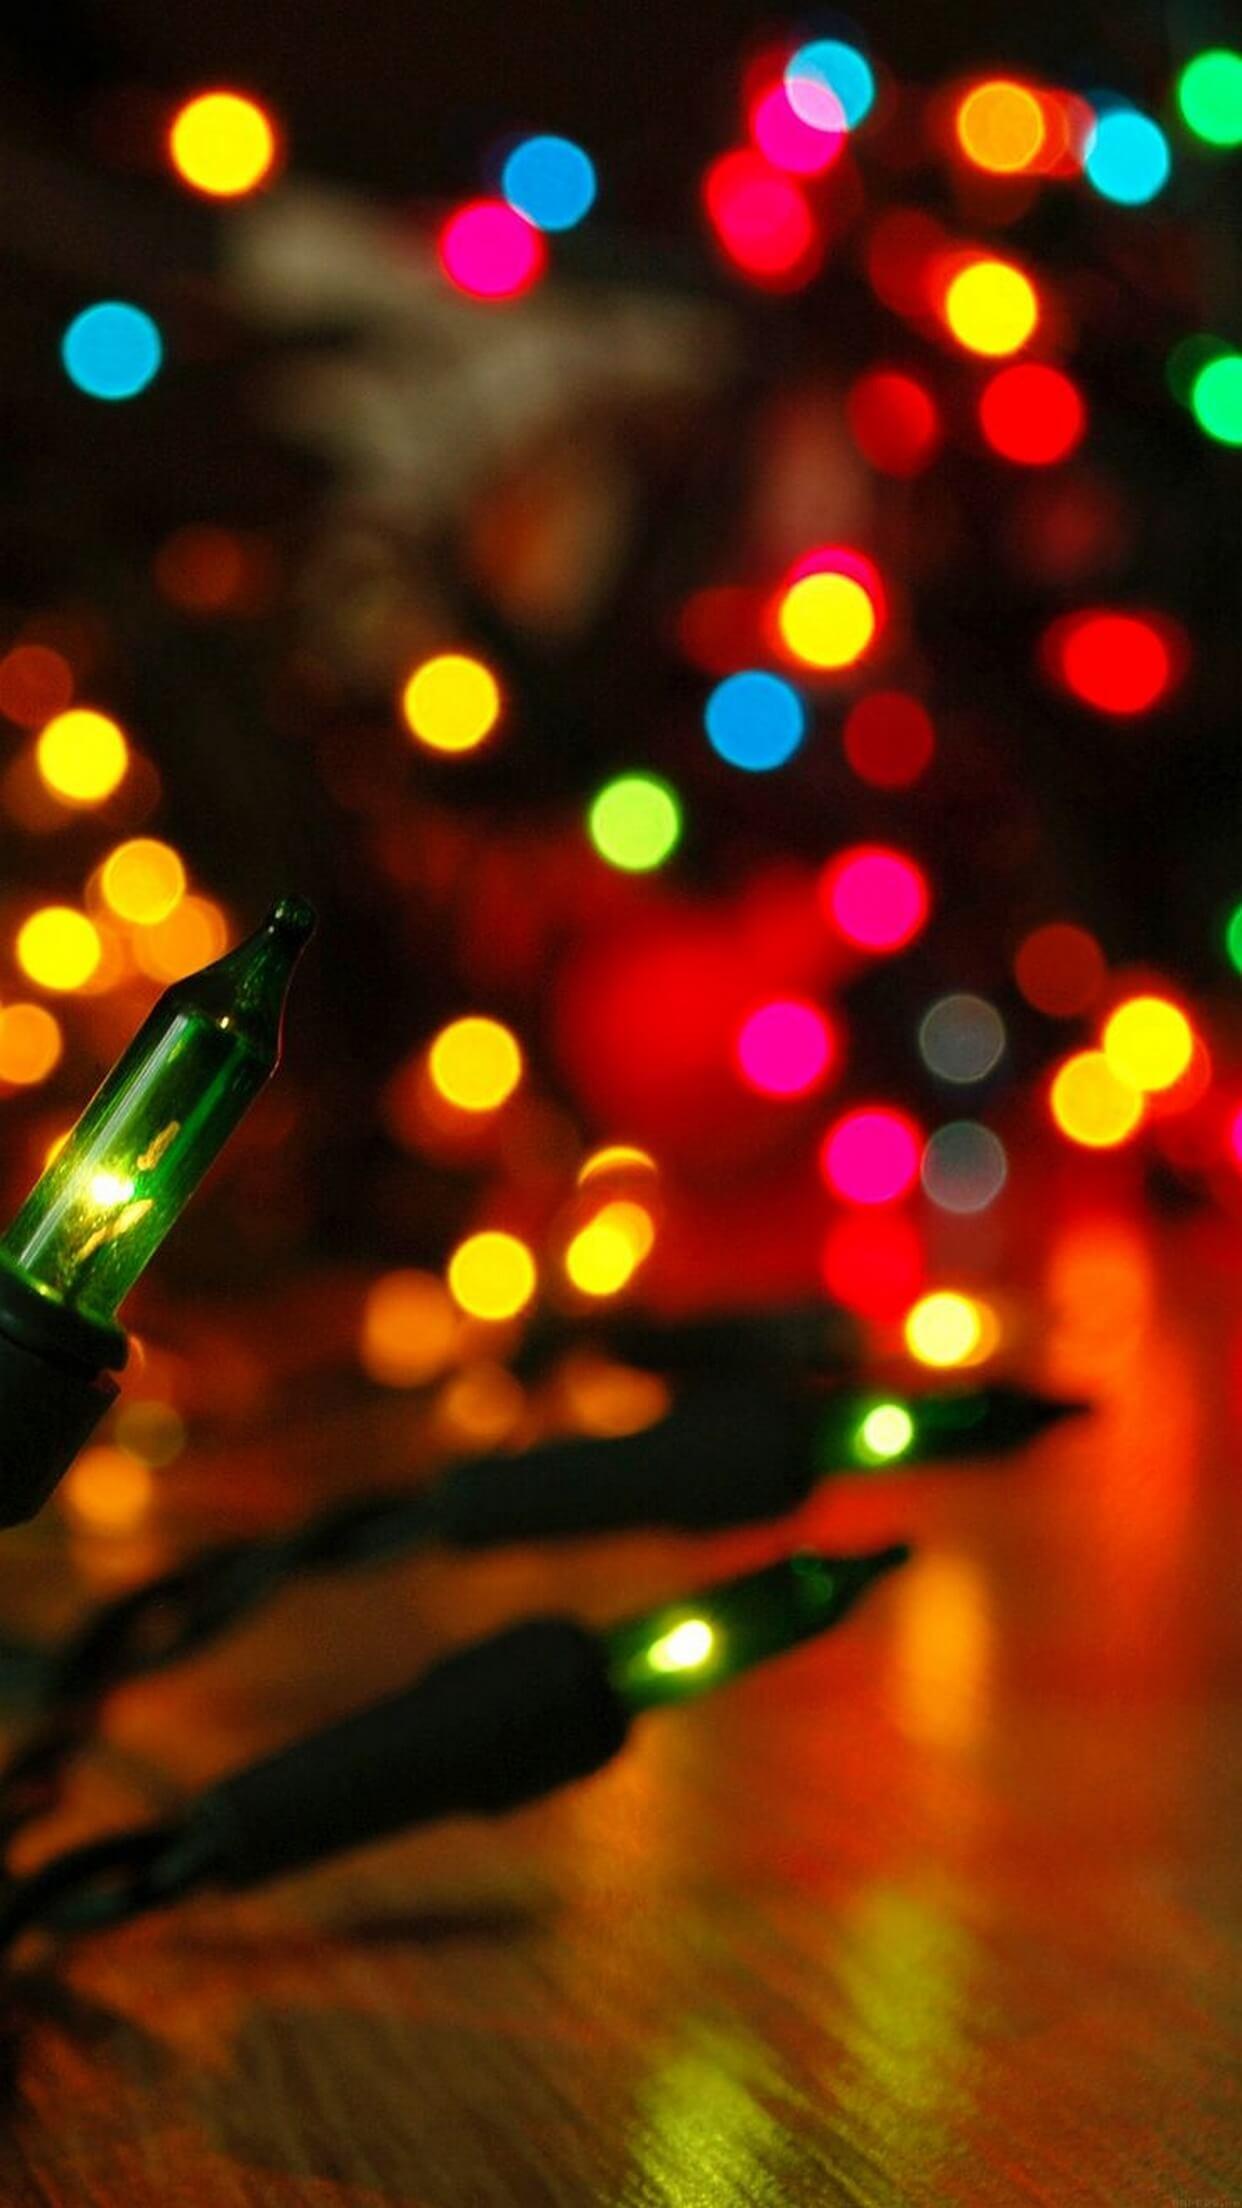 Christmas Lights iPhone Wallpaper (79+